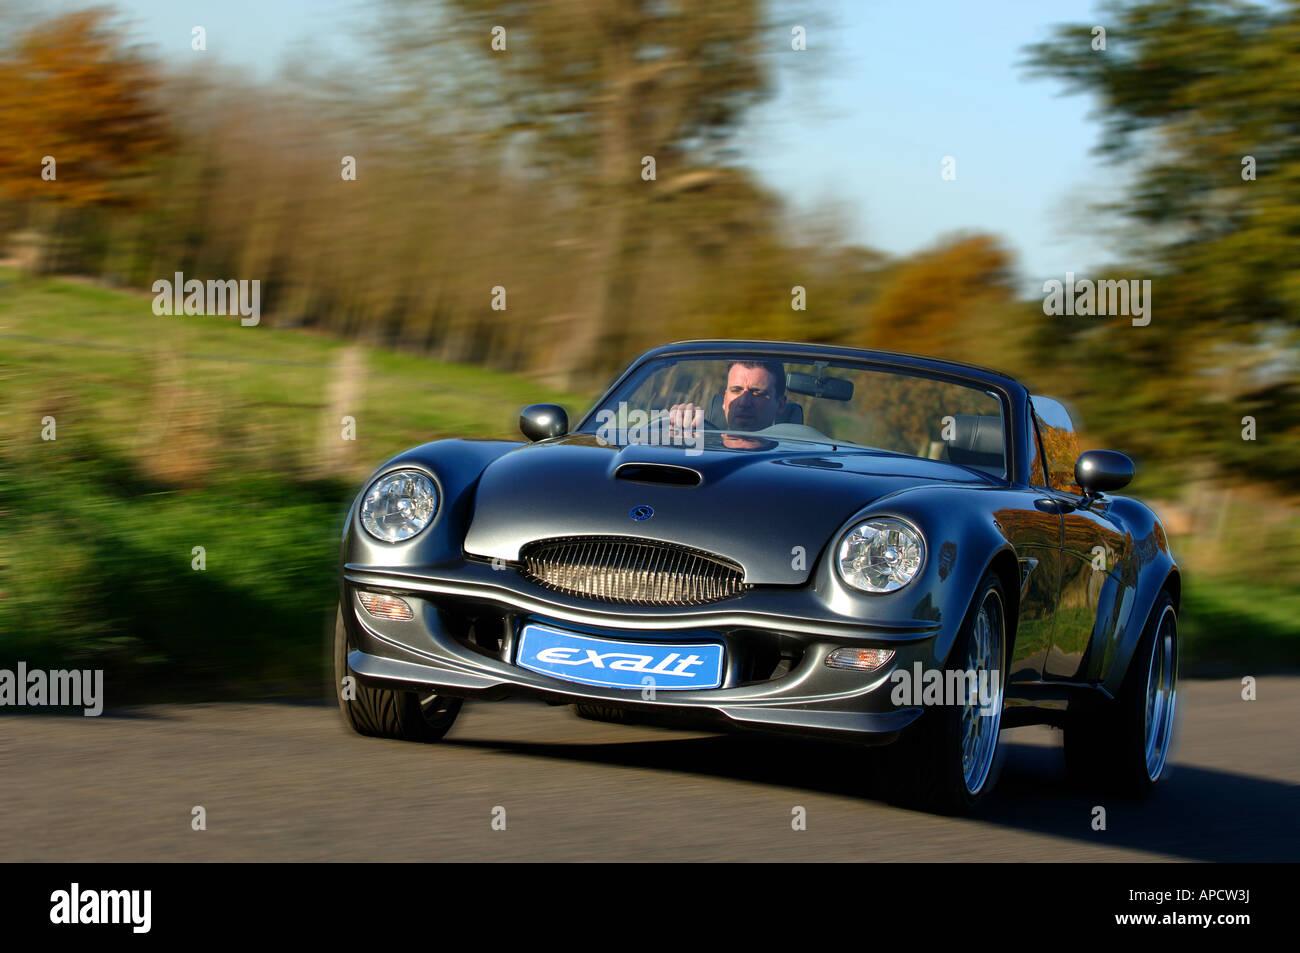 Sebring Exalt sports car - Stock Image